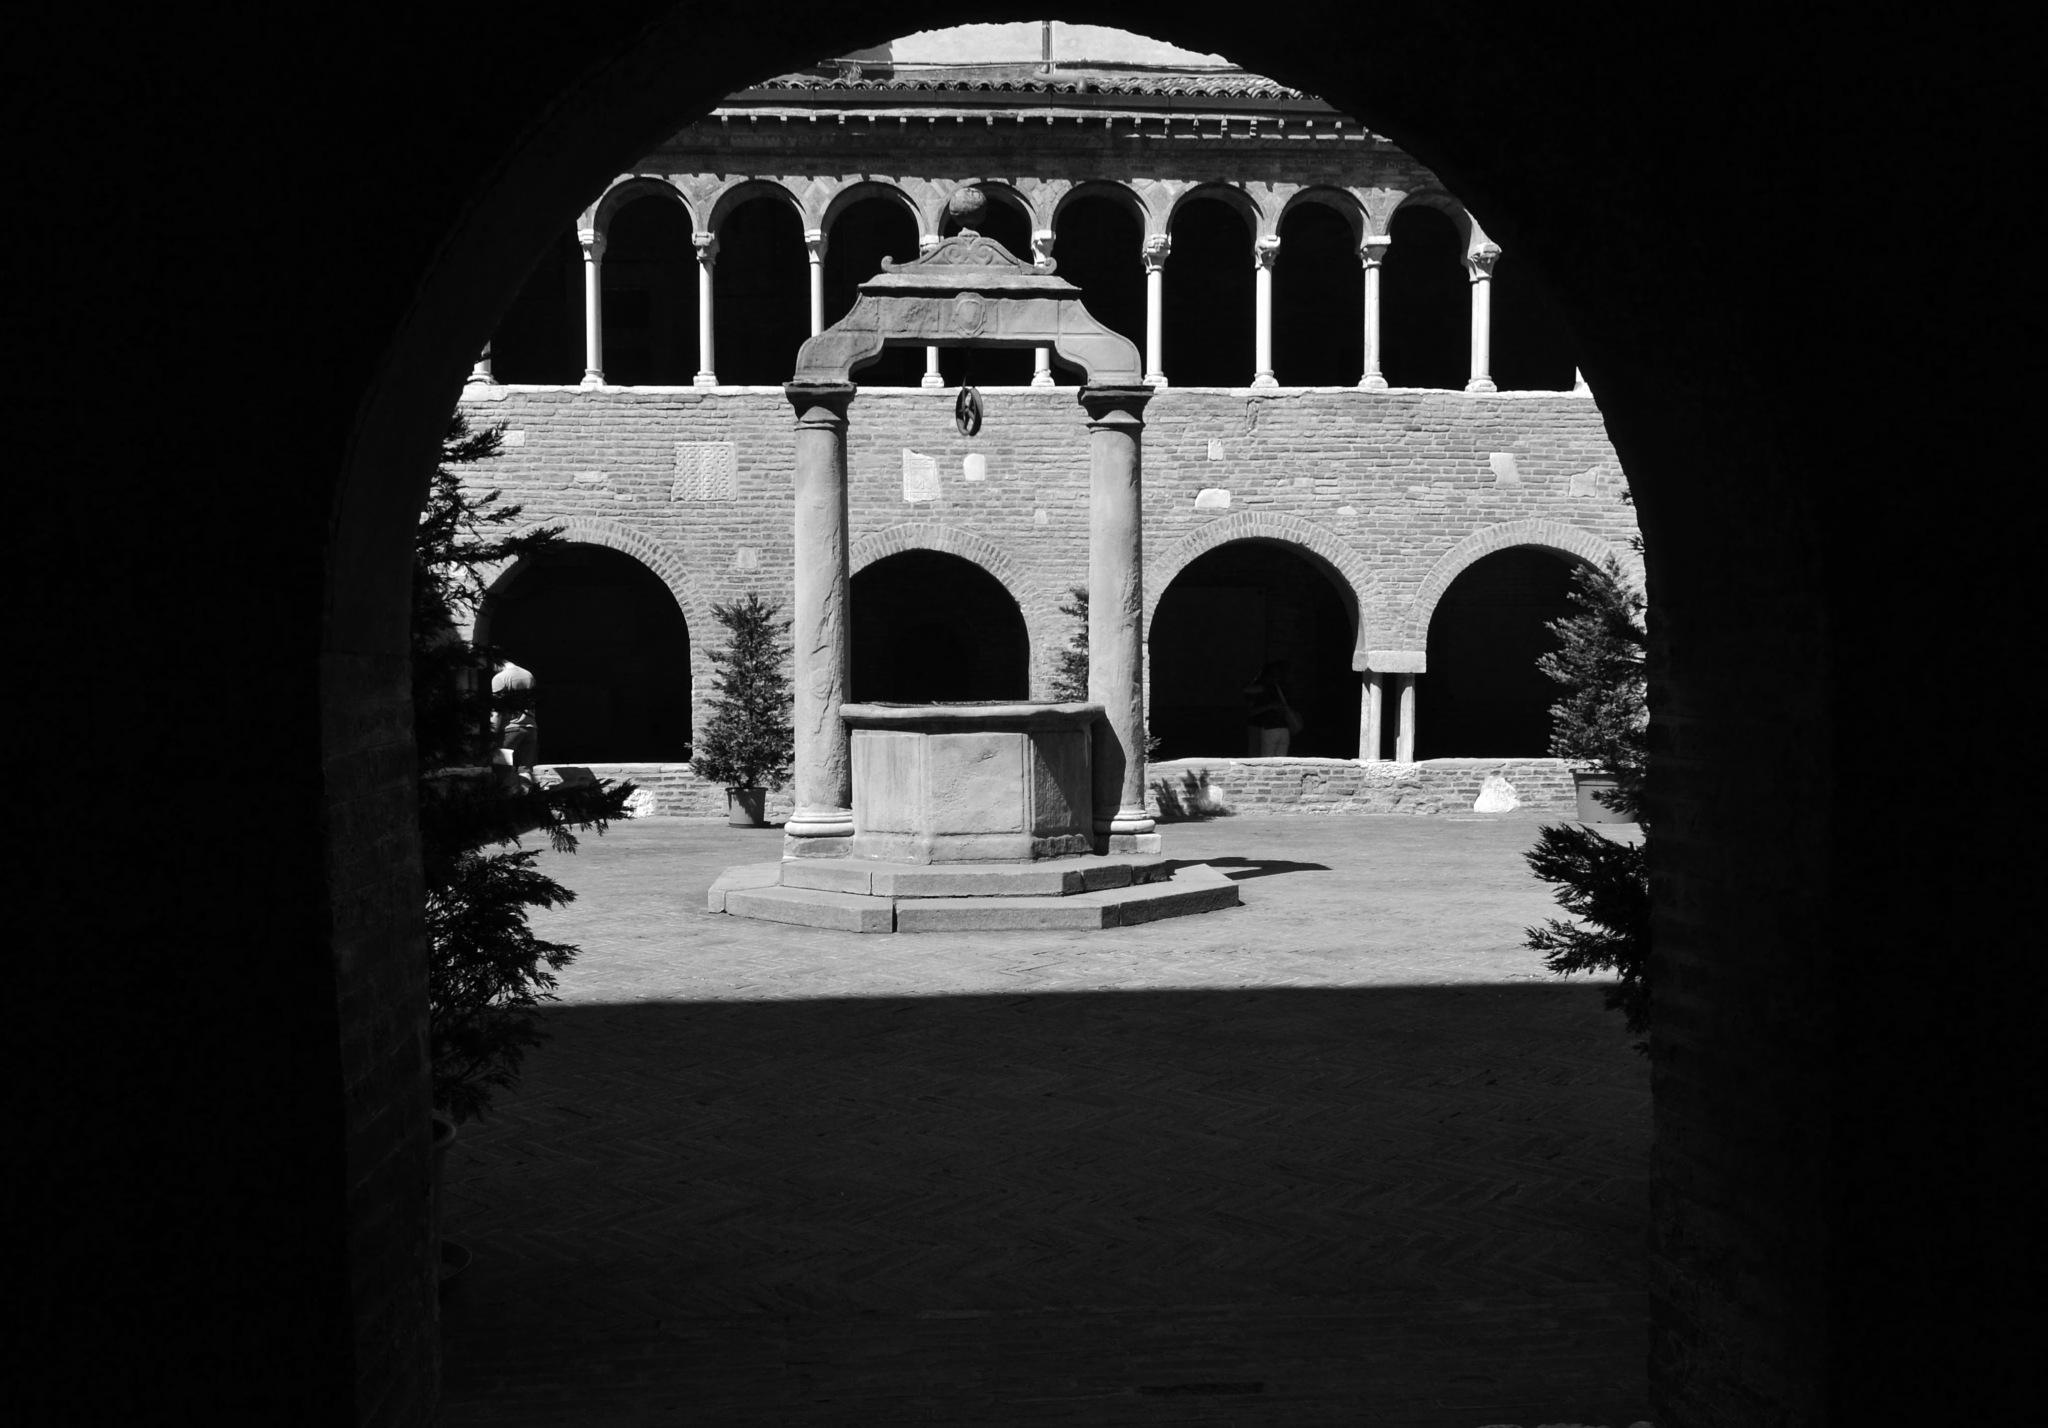 Arch by sanjabanika